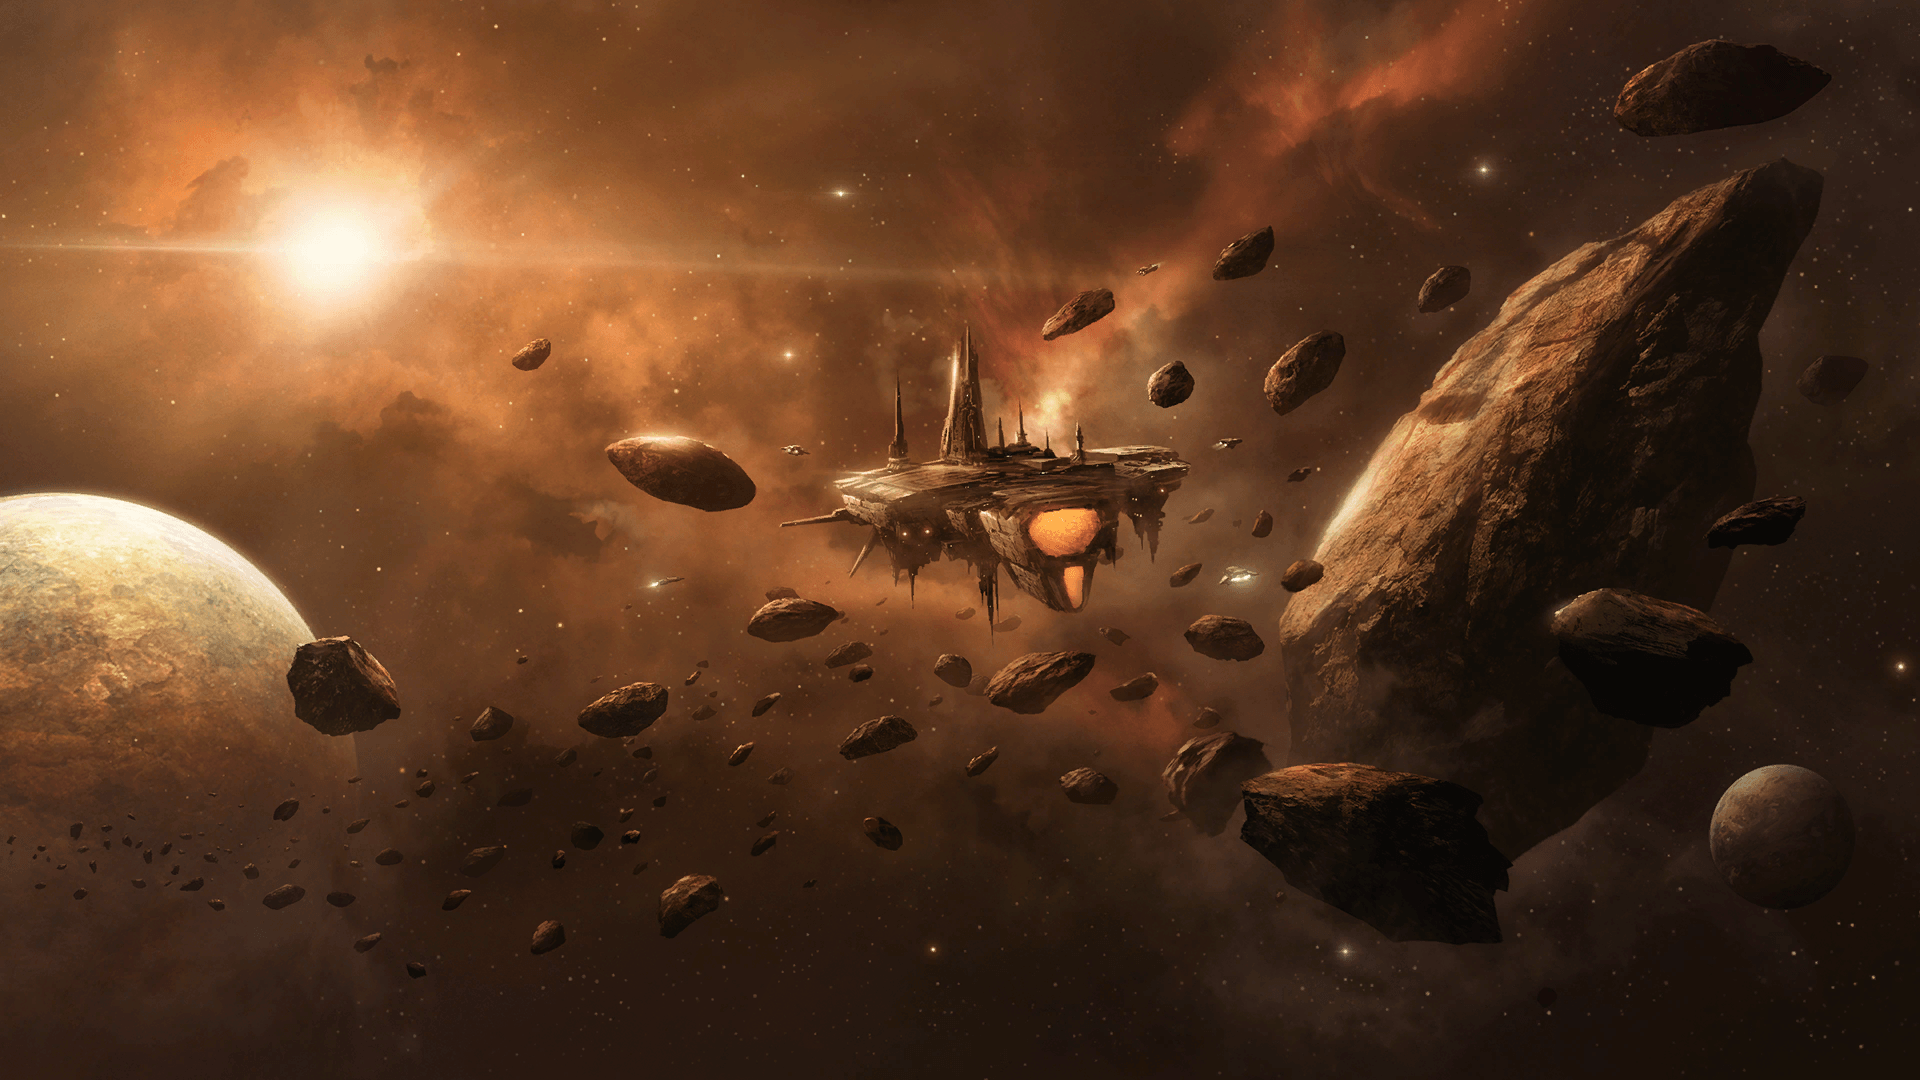 Stellaris: Apocalypse Download Free